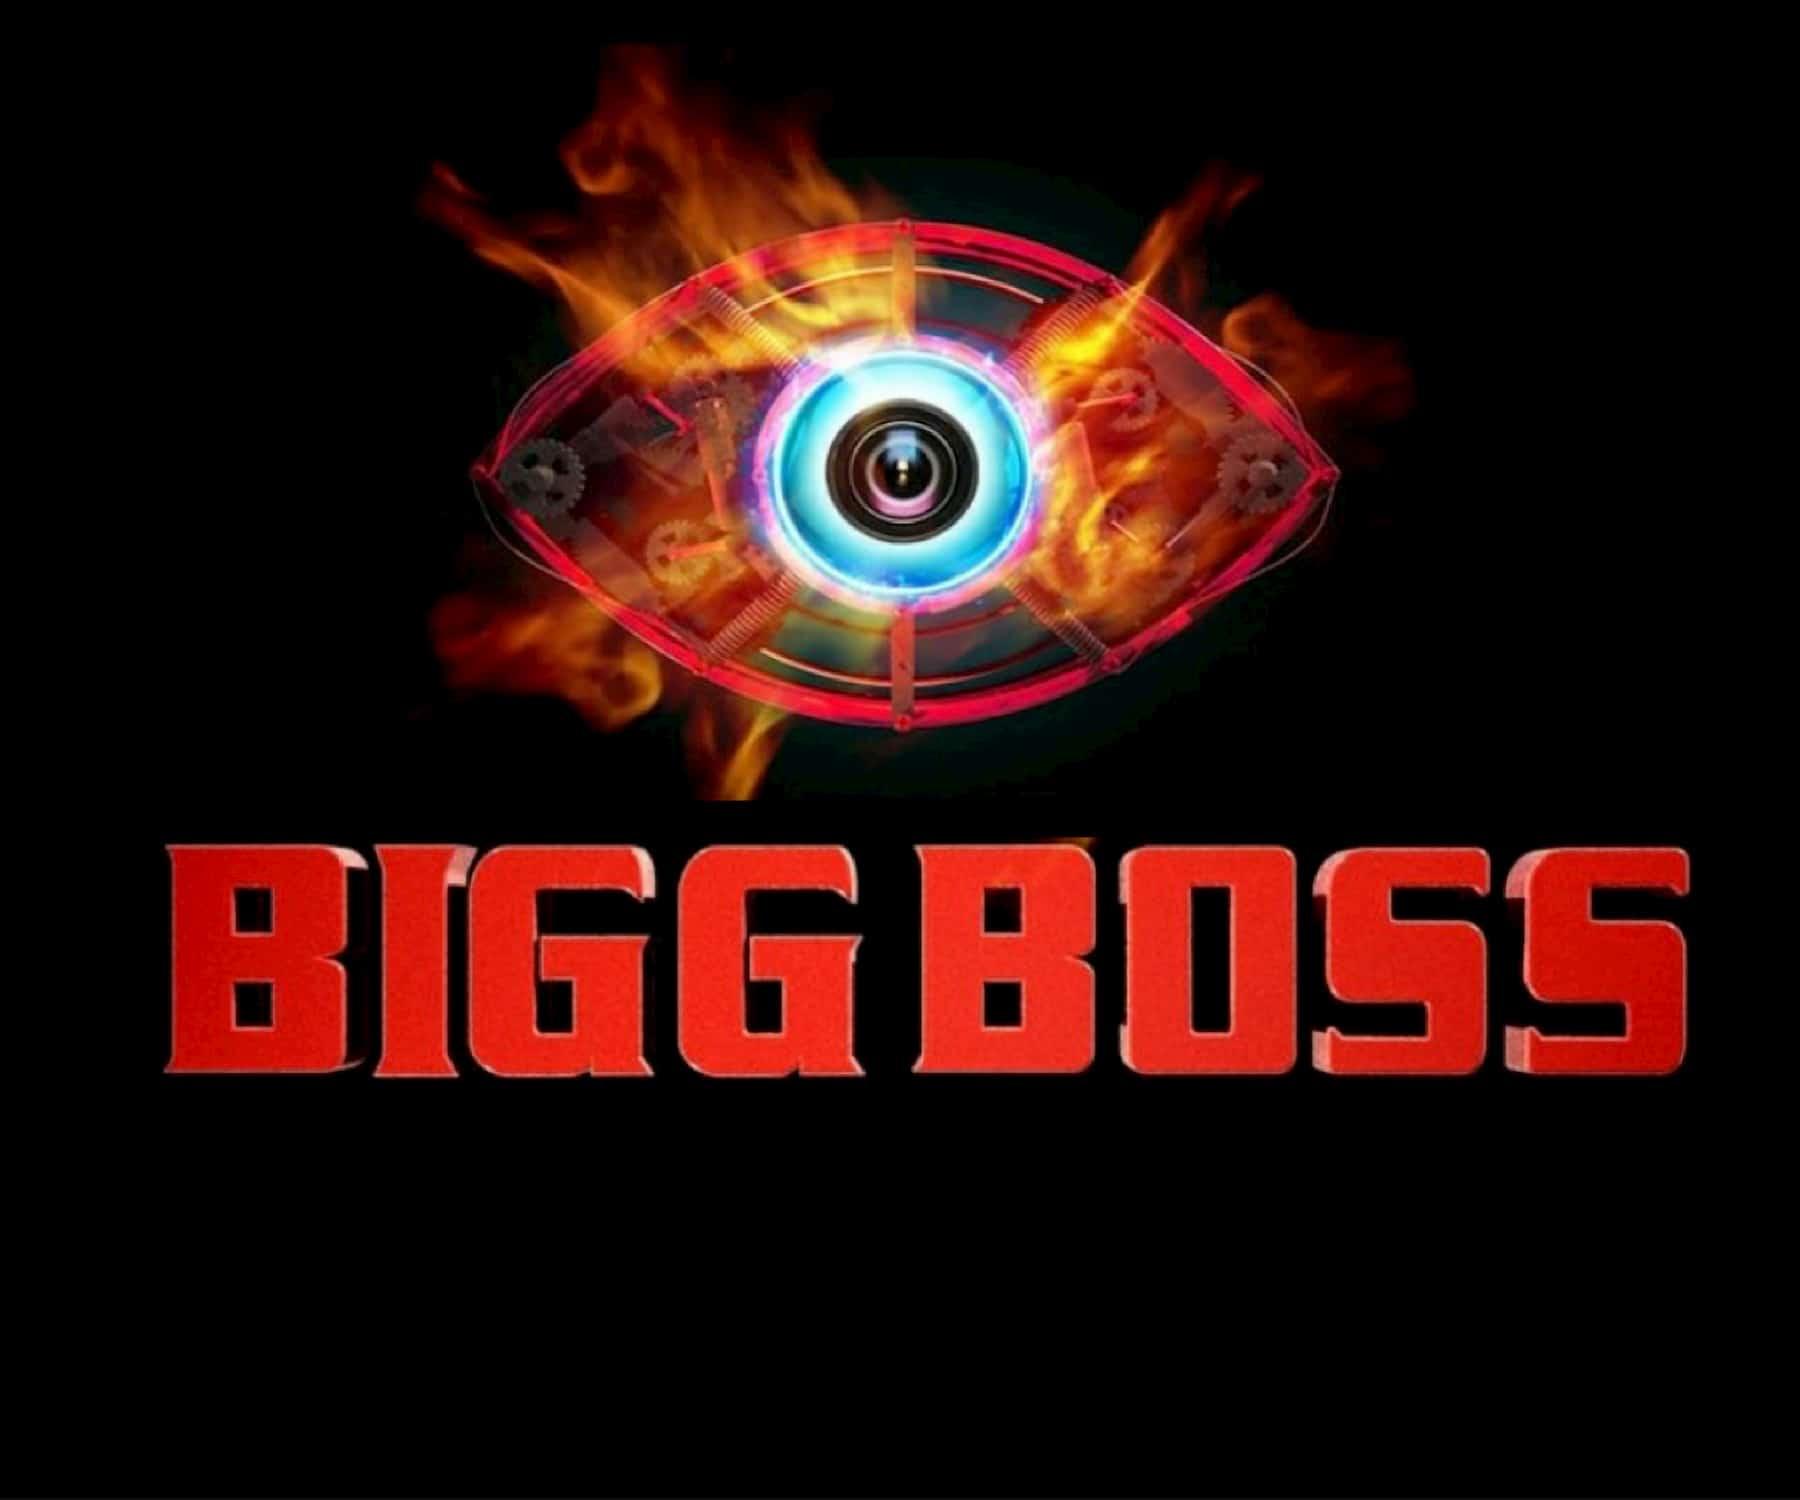 image from Bigg Boss